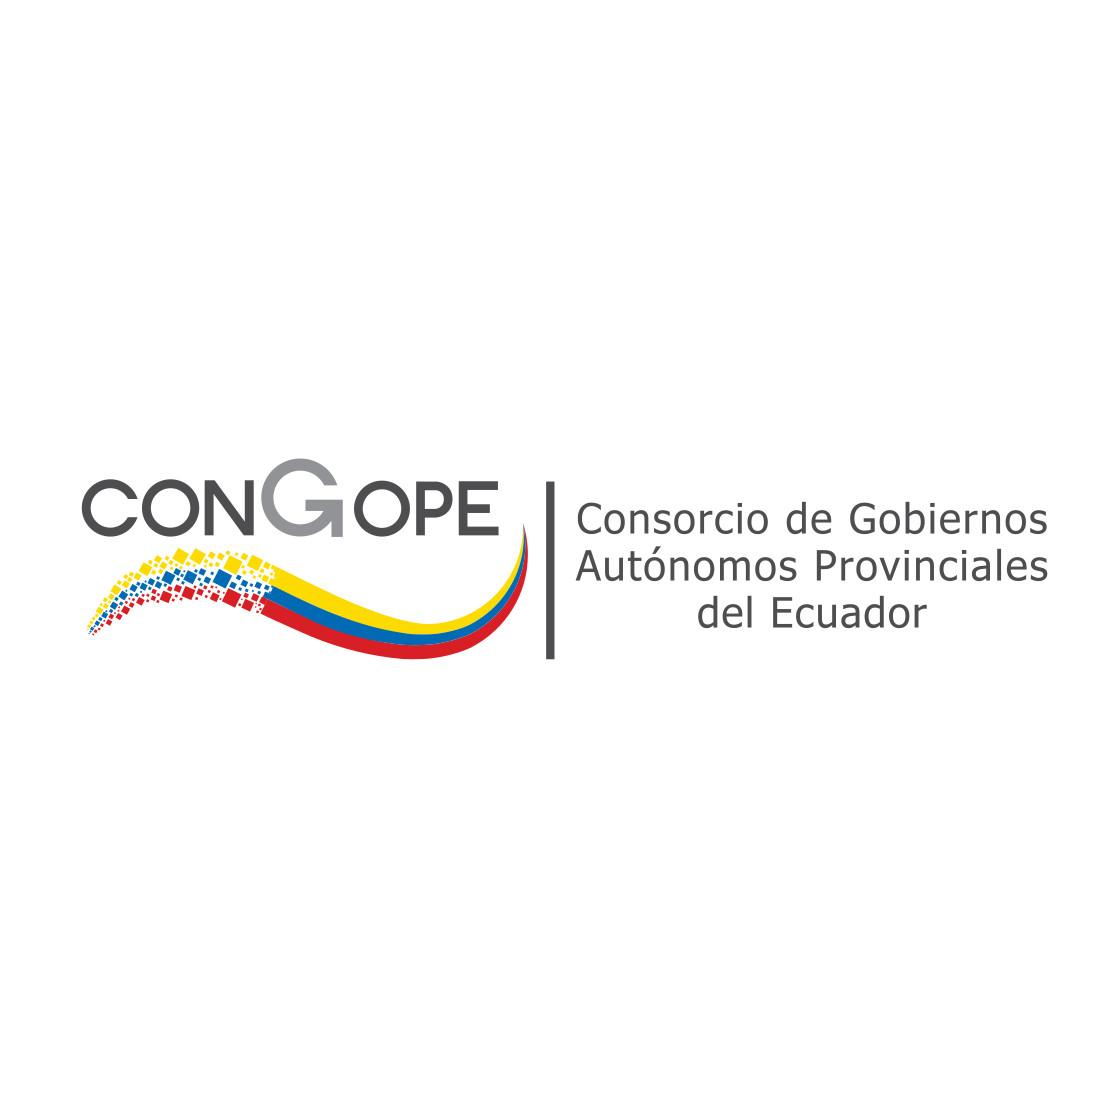 Logo aliados Congope